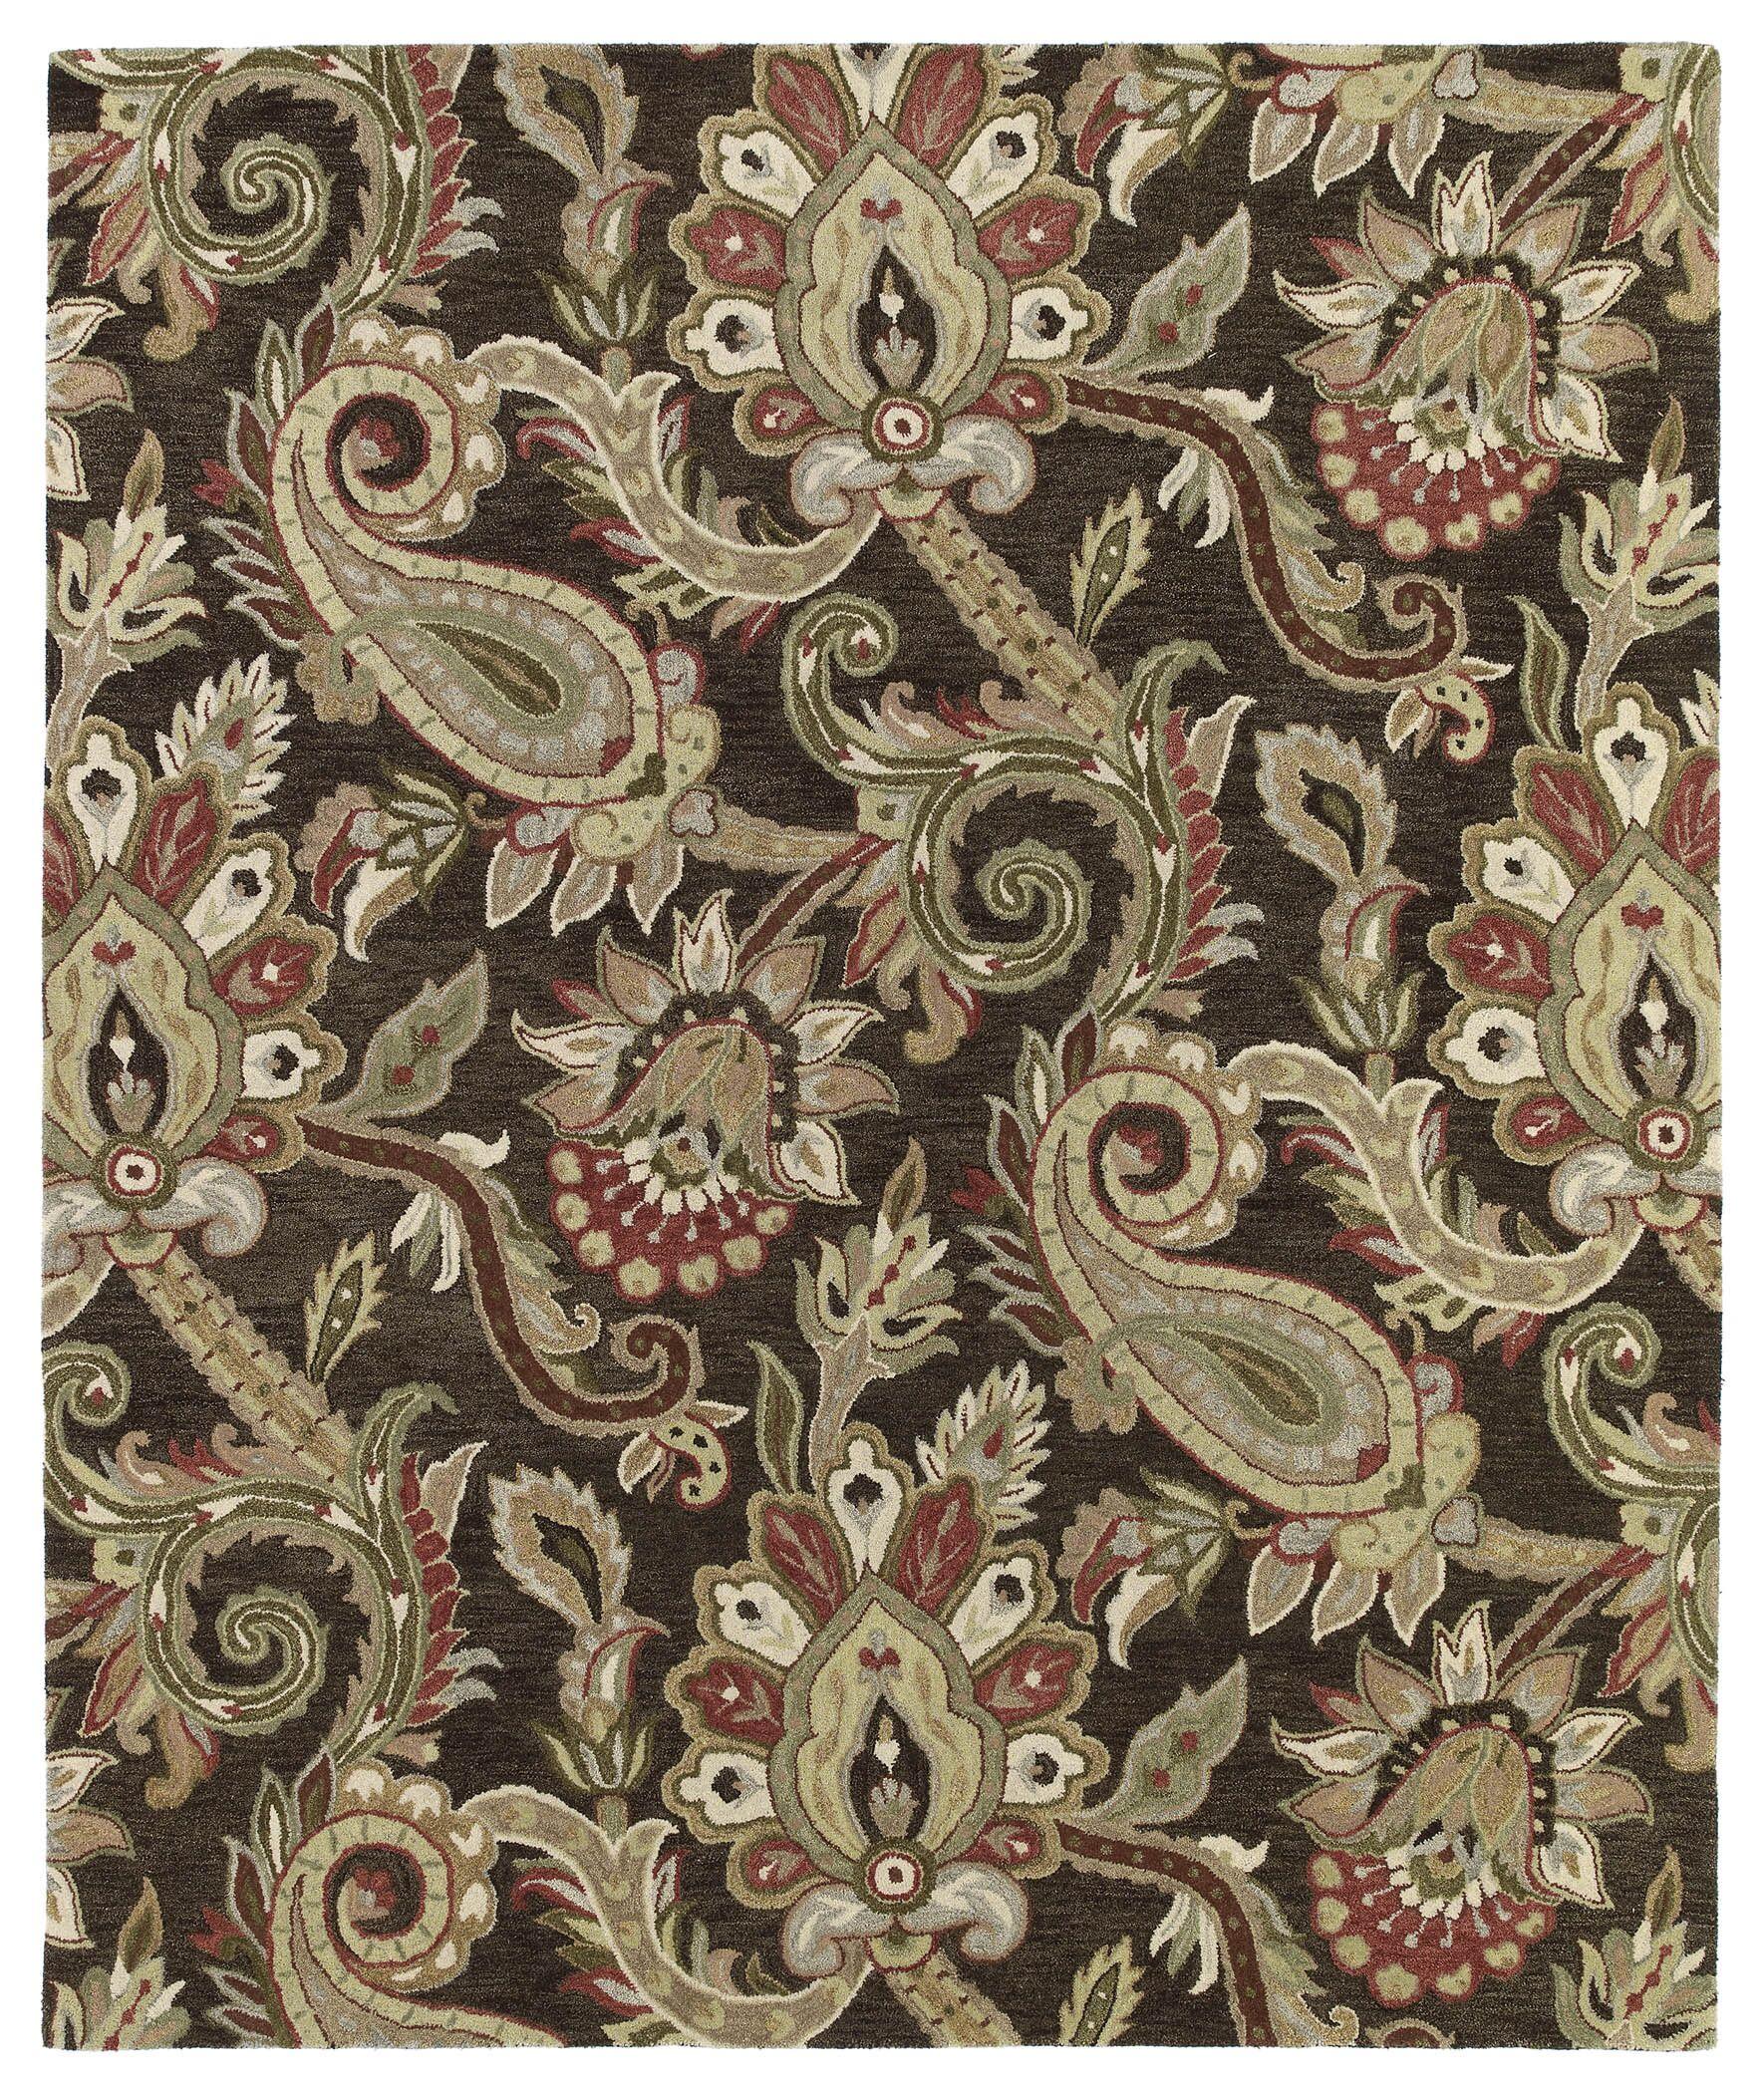 Casper Chocolate Odyusseus Brown/Tan Floral Area Rug Rug Size: Rectangle 8' x 10'